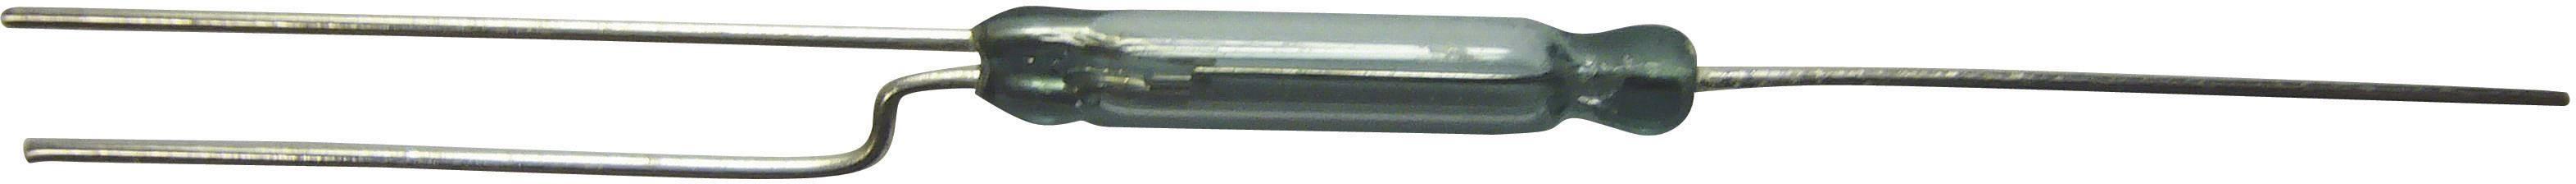 Jazyčkový kontakt Hamlin MDRR-DT, 1 prepínací, 175 V/DC, 0.25 A, 5 W